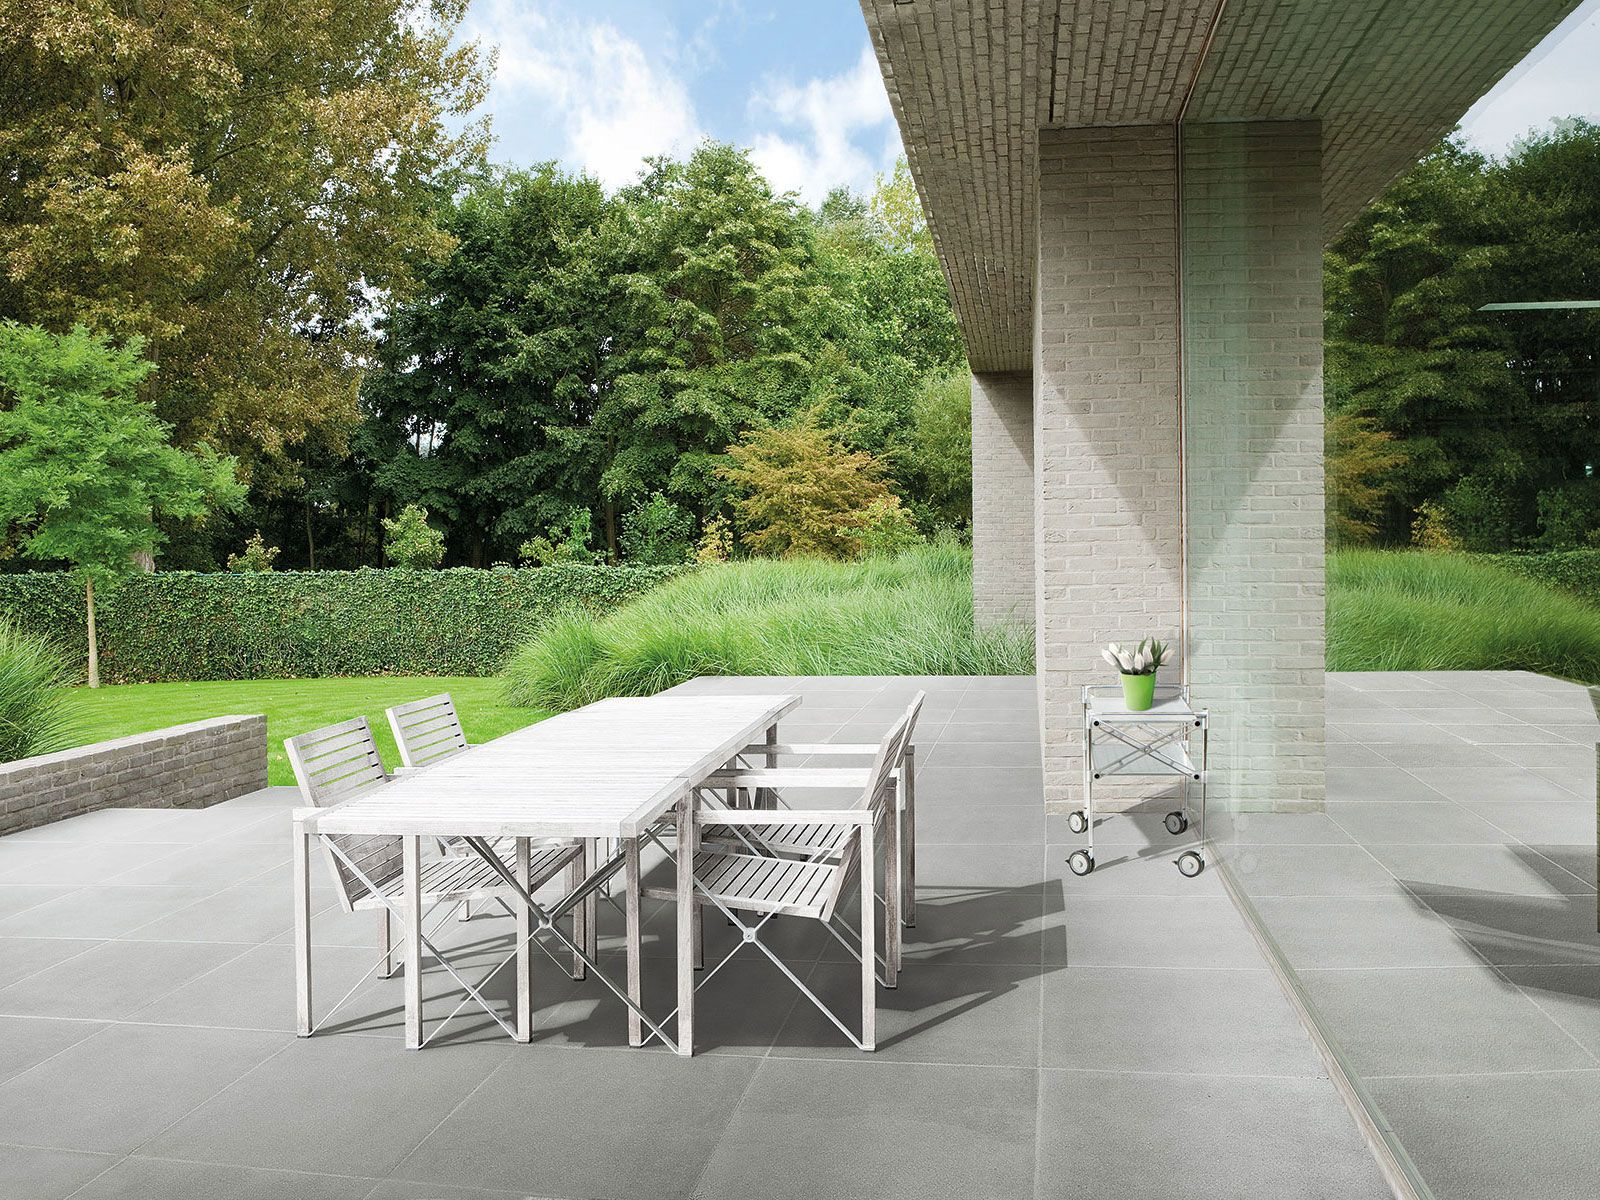 terrassenplatten reinigen beton 1000 ideas about. Black Bedroom Furniture Sets. Home Design Ideas